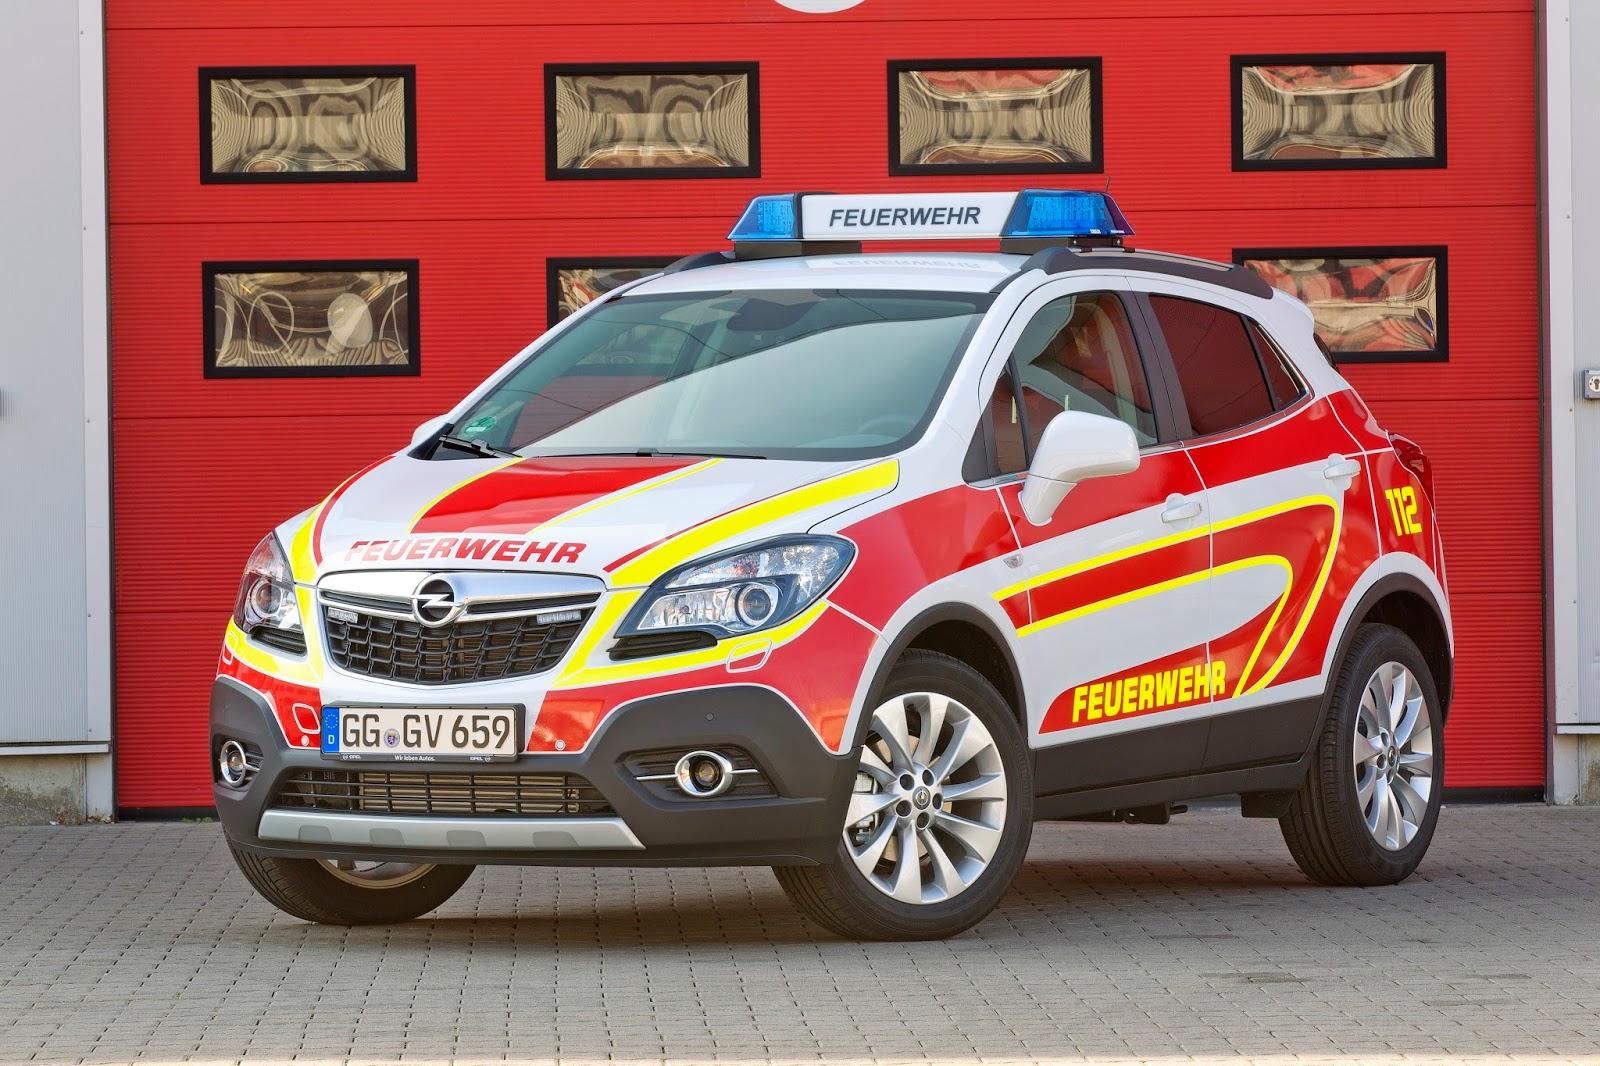 2016 Opel RETTmobil 295615 Το Opel Astra Sports Tourer ως όχημα άμεσης επέμβασης σε περιπτώσεις έκτακτης ανάγκης Opel, Opel Astra Sports Tourer, Opel Movano, RETTmobil, Έκθεση, Επαγγελματικά